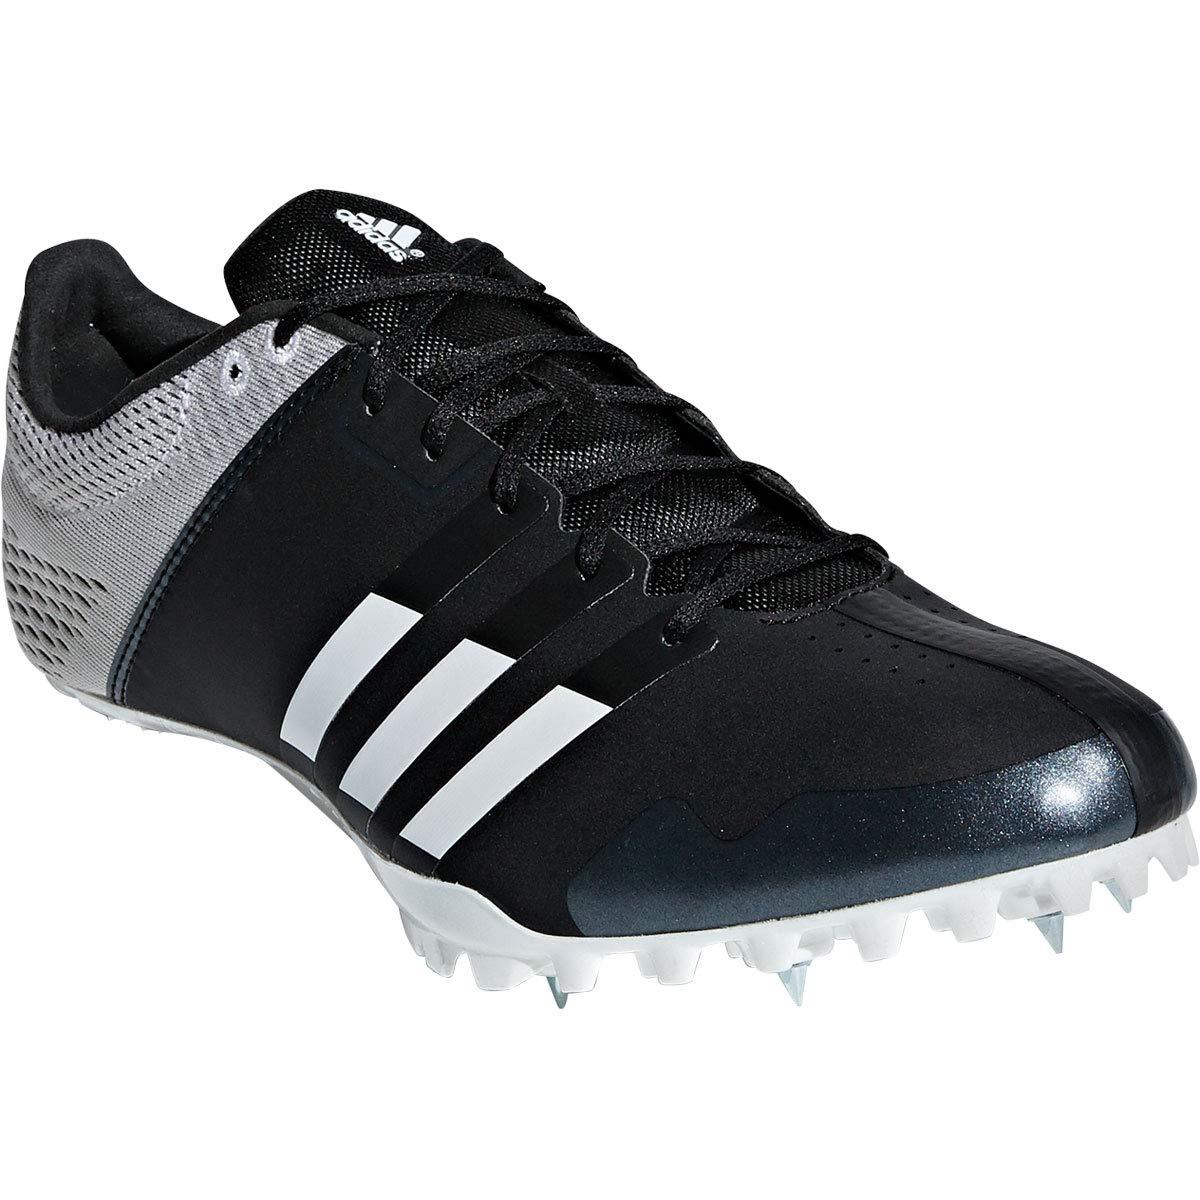 Noir (Negbás Ftwbla Ftwbla 000) 42 2 3 EU adidas Adizero Finesse, Chaussures d'Athlétisme Mixte Adulte